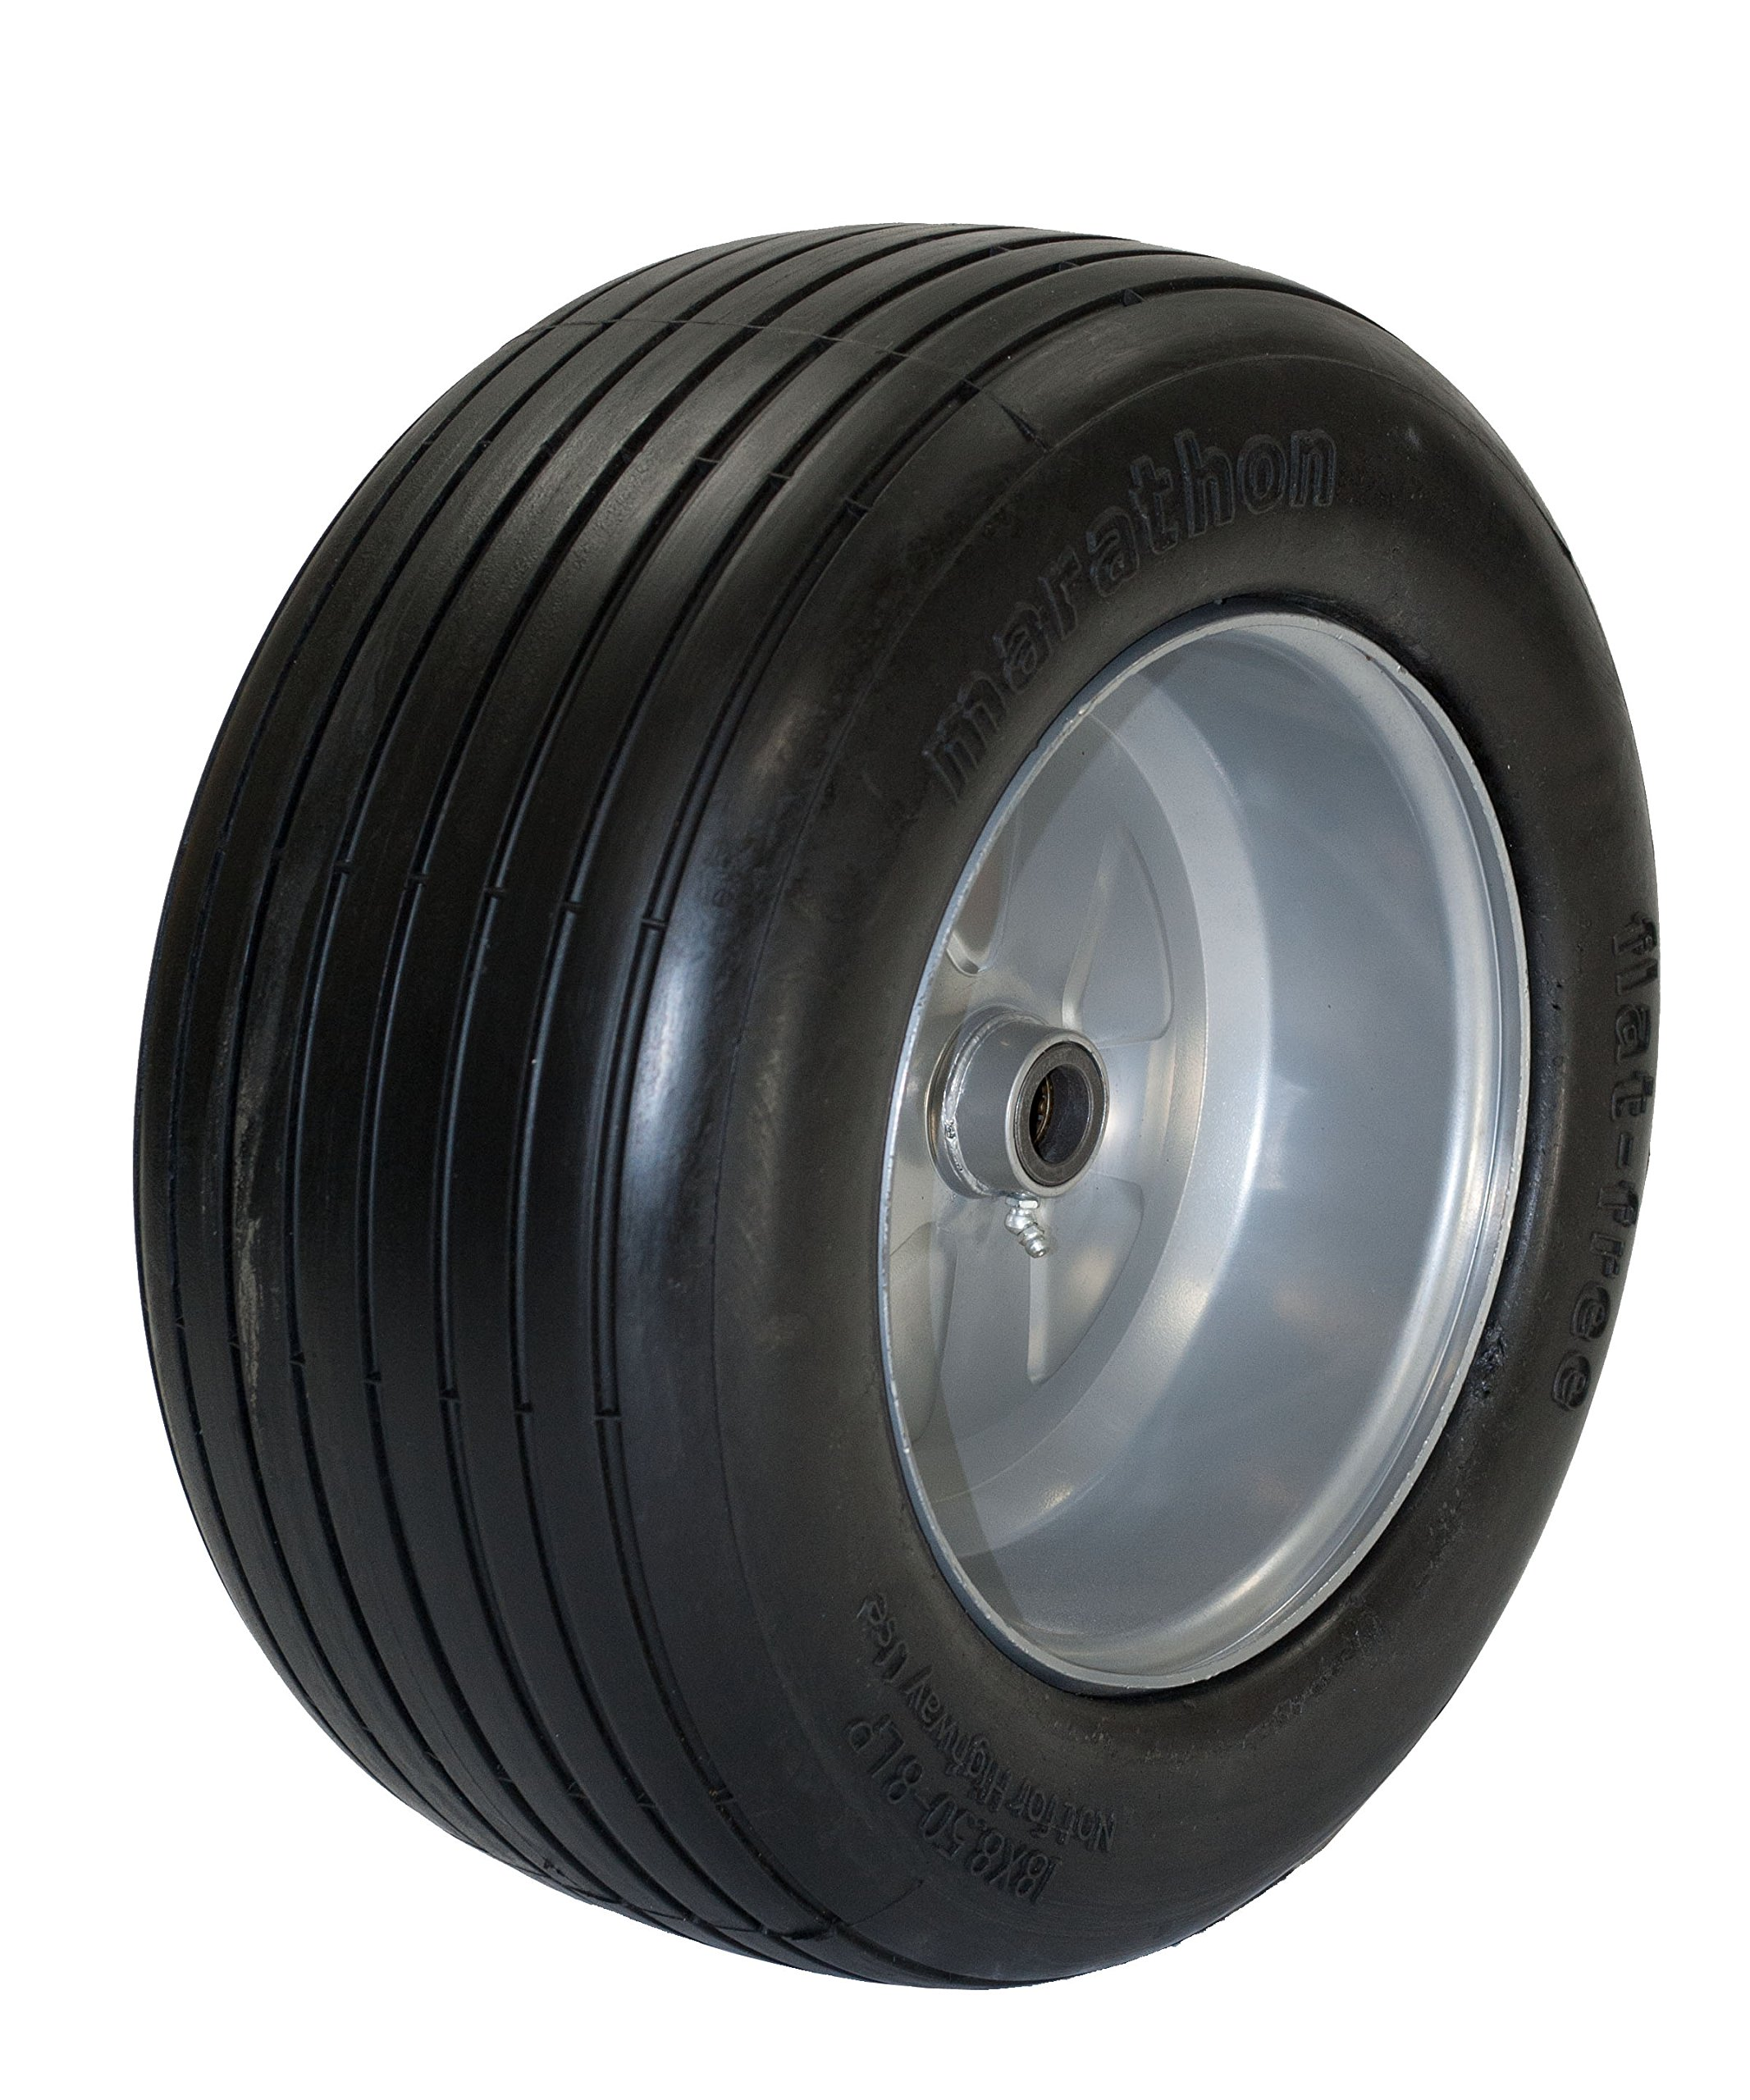 Marathon 18x8.50-8'' Flat Free Tire on Wheel, 3.25'' Hub, 1'' Roller Bearing